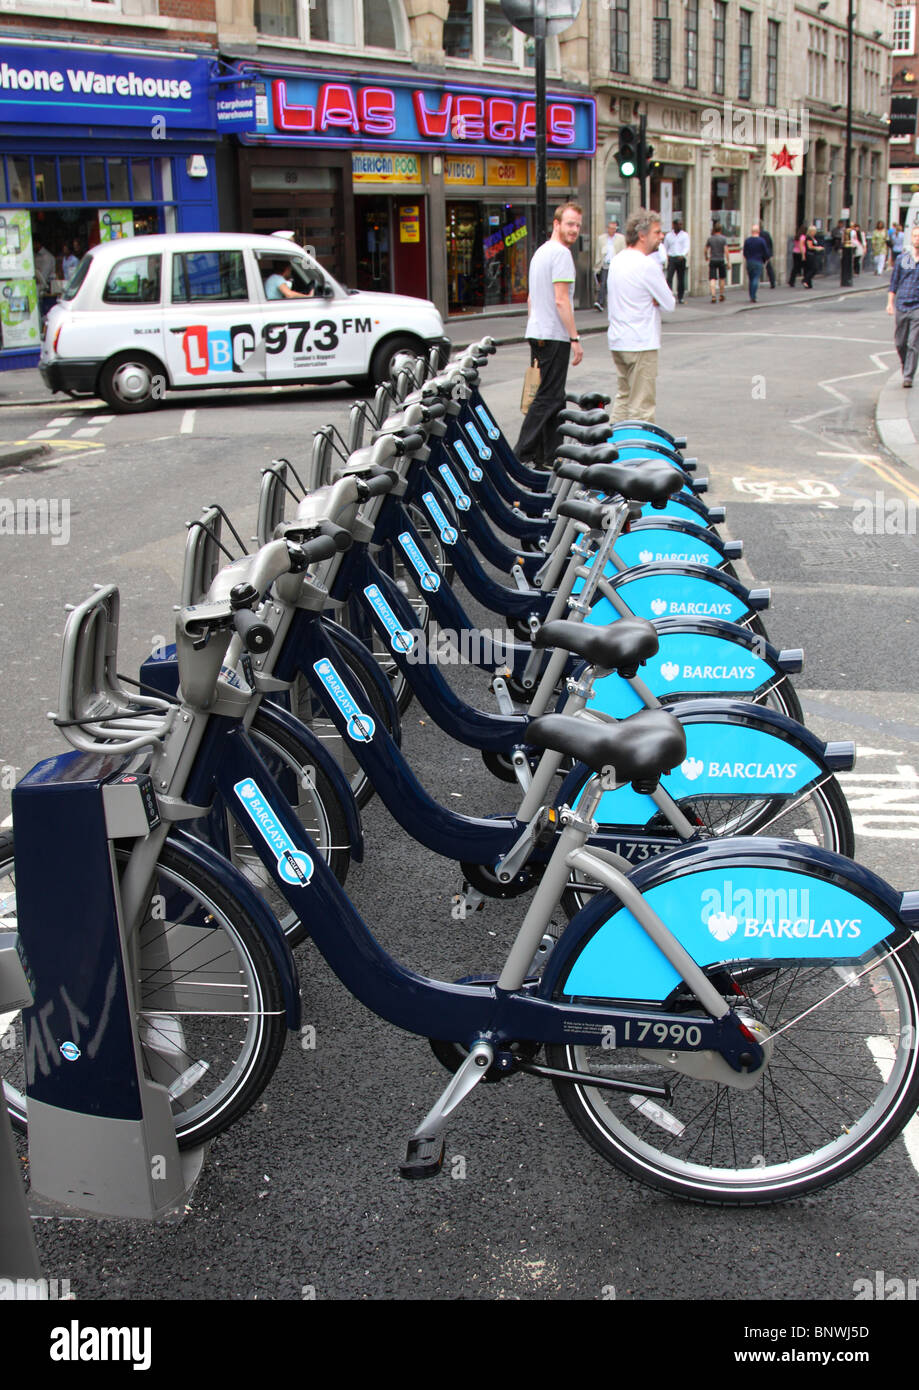 Transport for London (TFL) & Barclays cycle hire, Wardour Street, Soho, London, England, U.K. - Stock Image